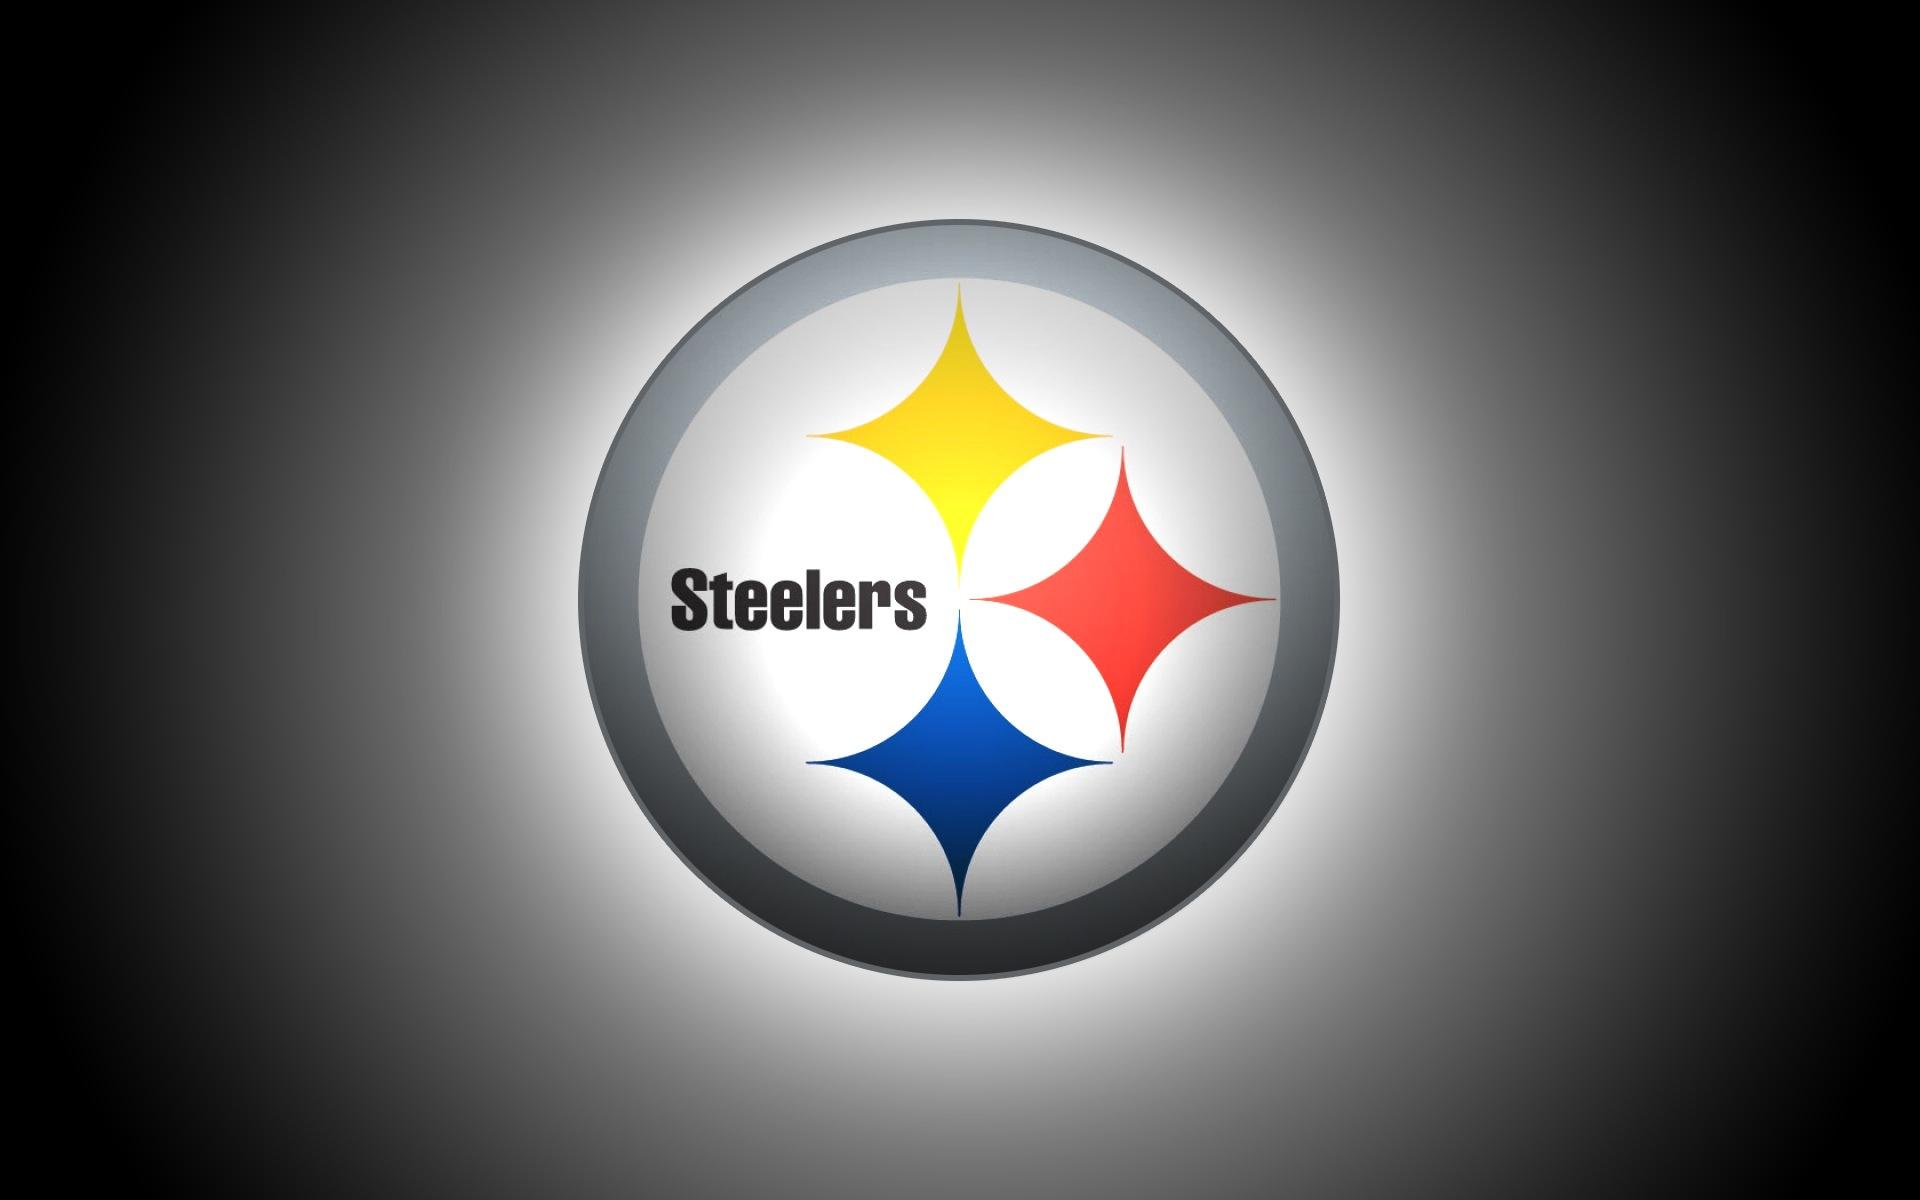 Pittsburgh Steelers desktop wallpaper 1920x1200